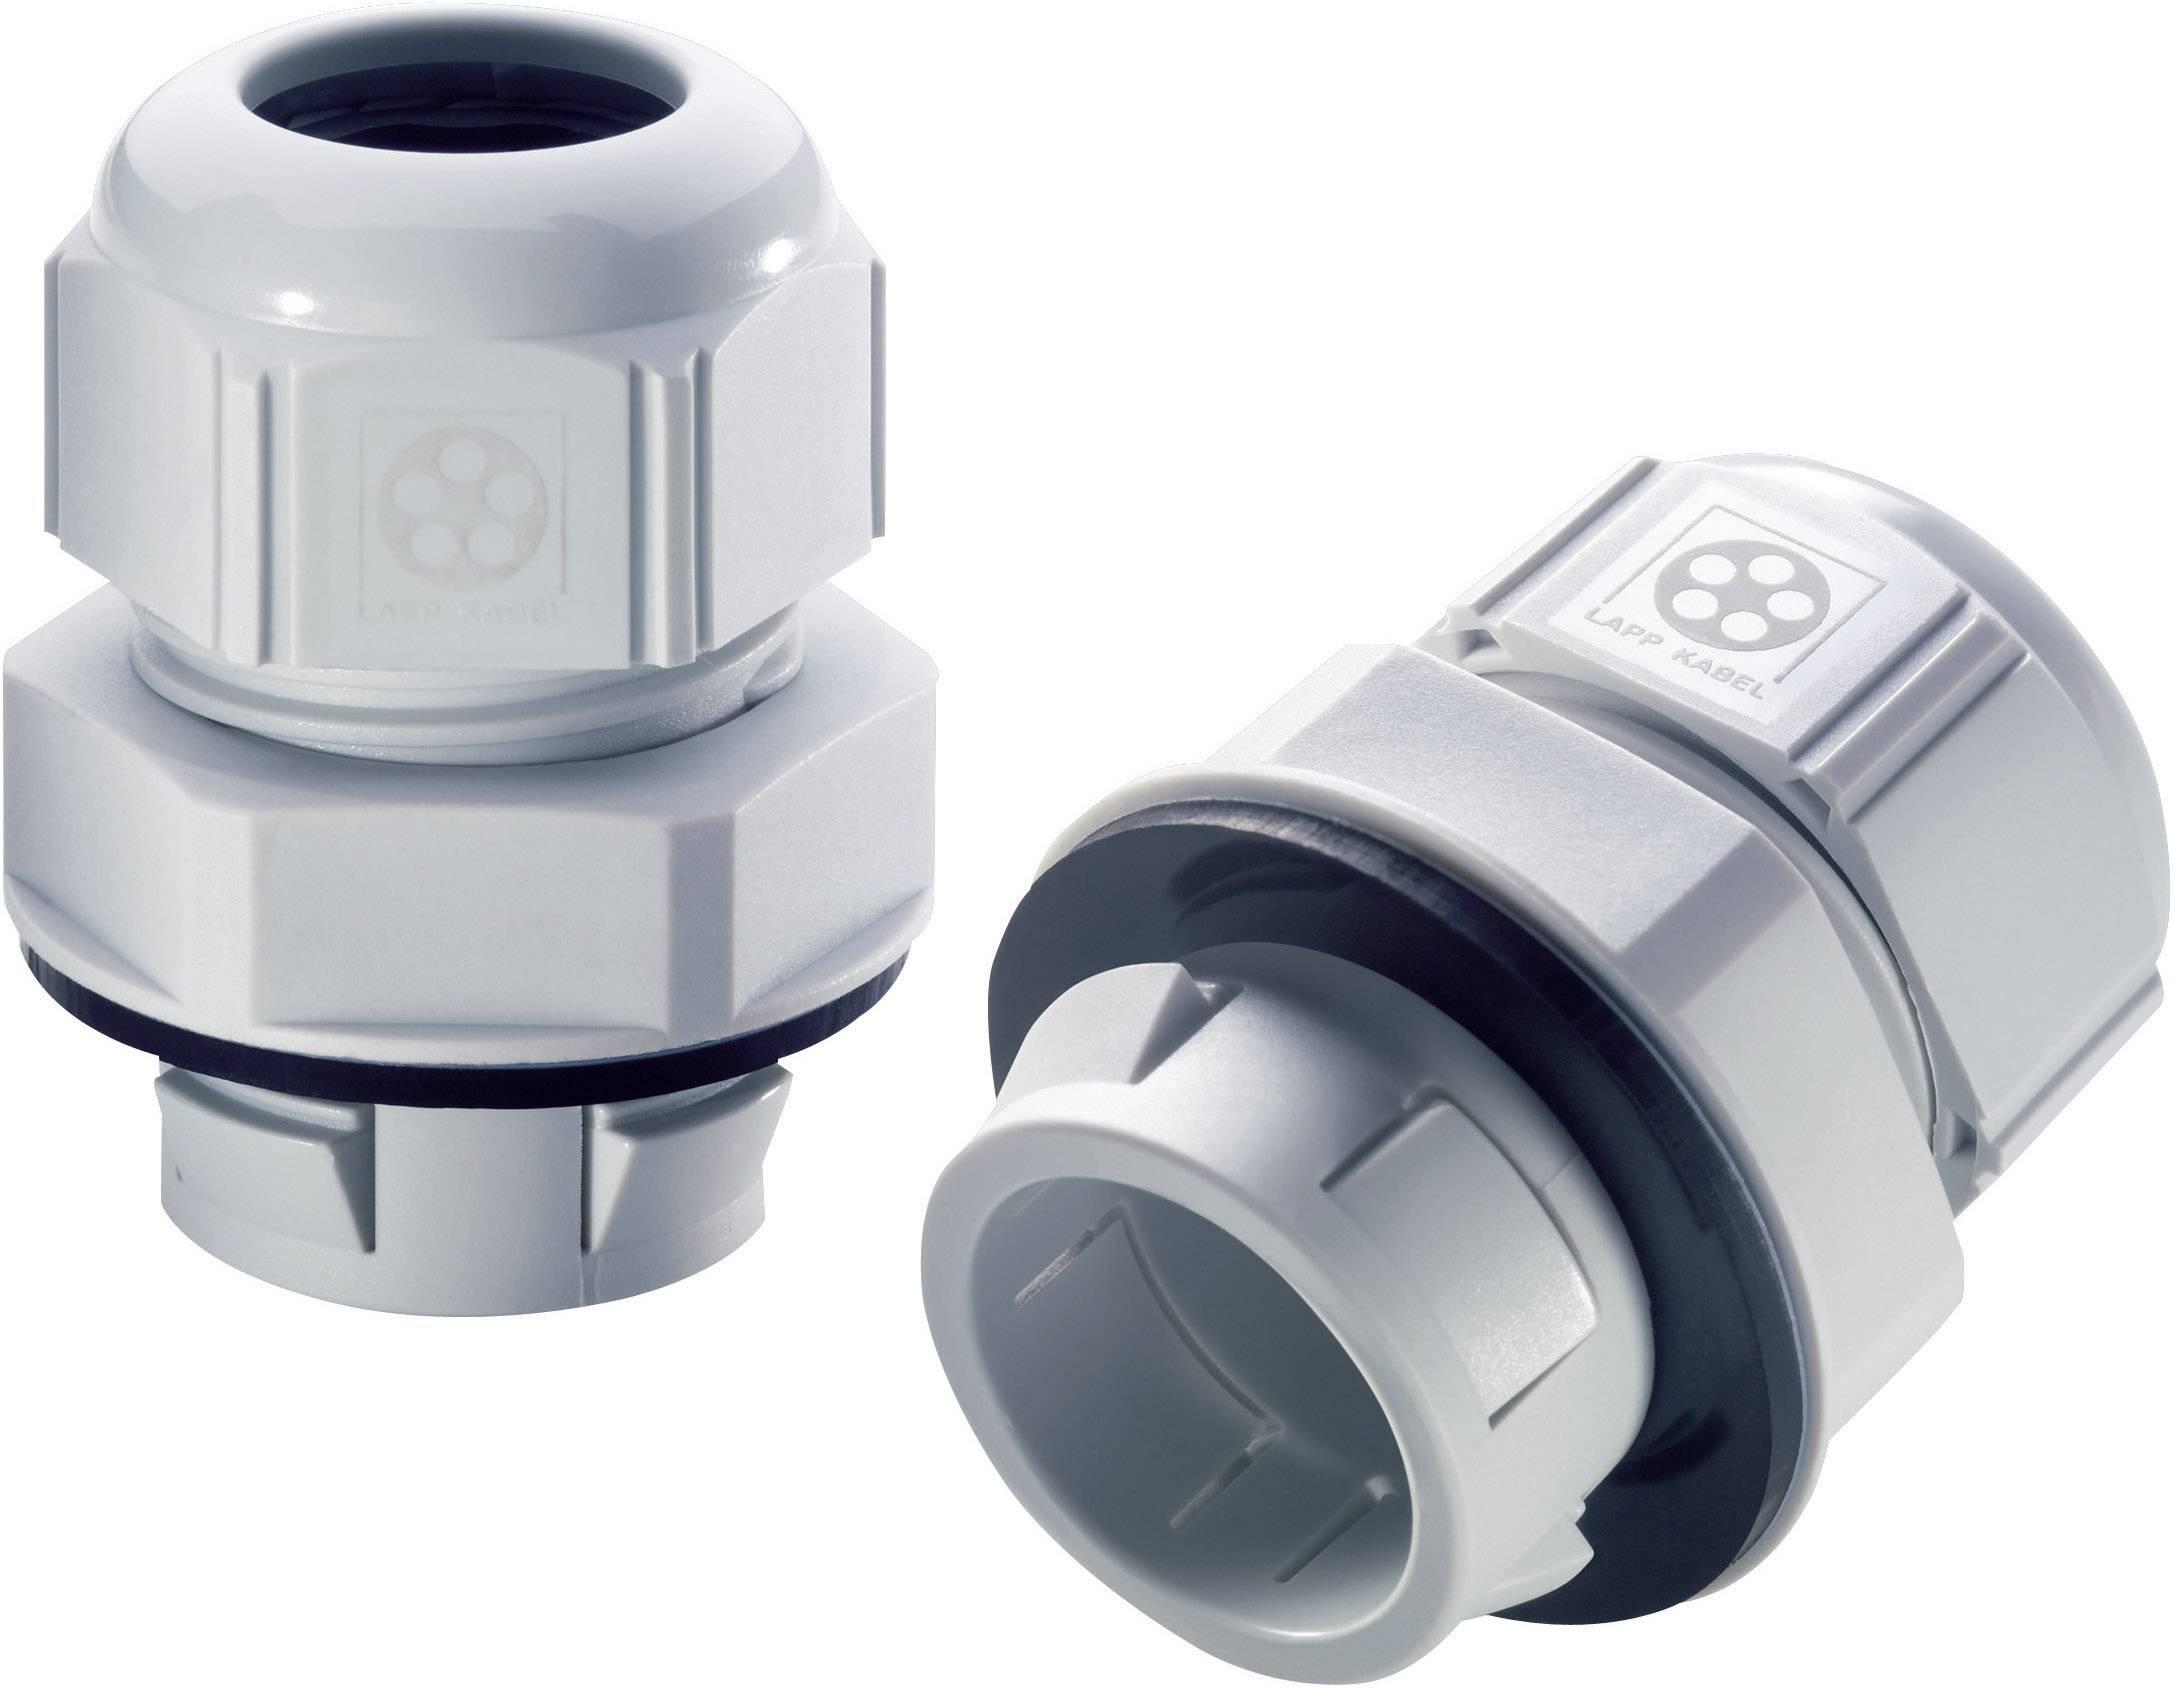 Káblová priechodka LappKabel SKINTOP® CLICK 20, polyamid, svetlo sivá (RAL 7035), 1 ks